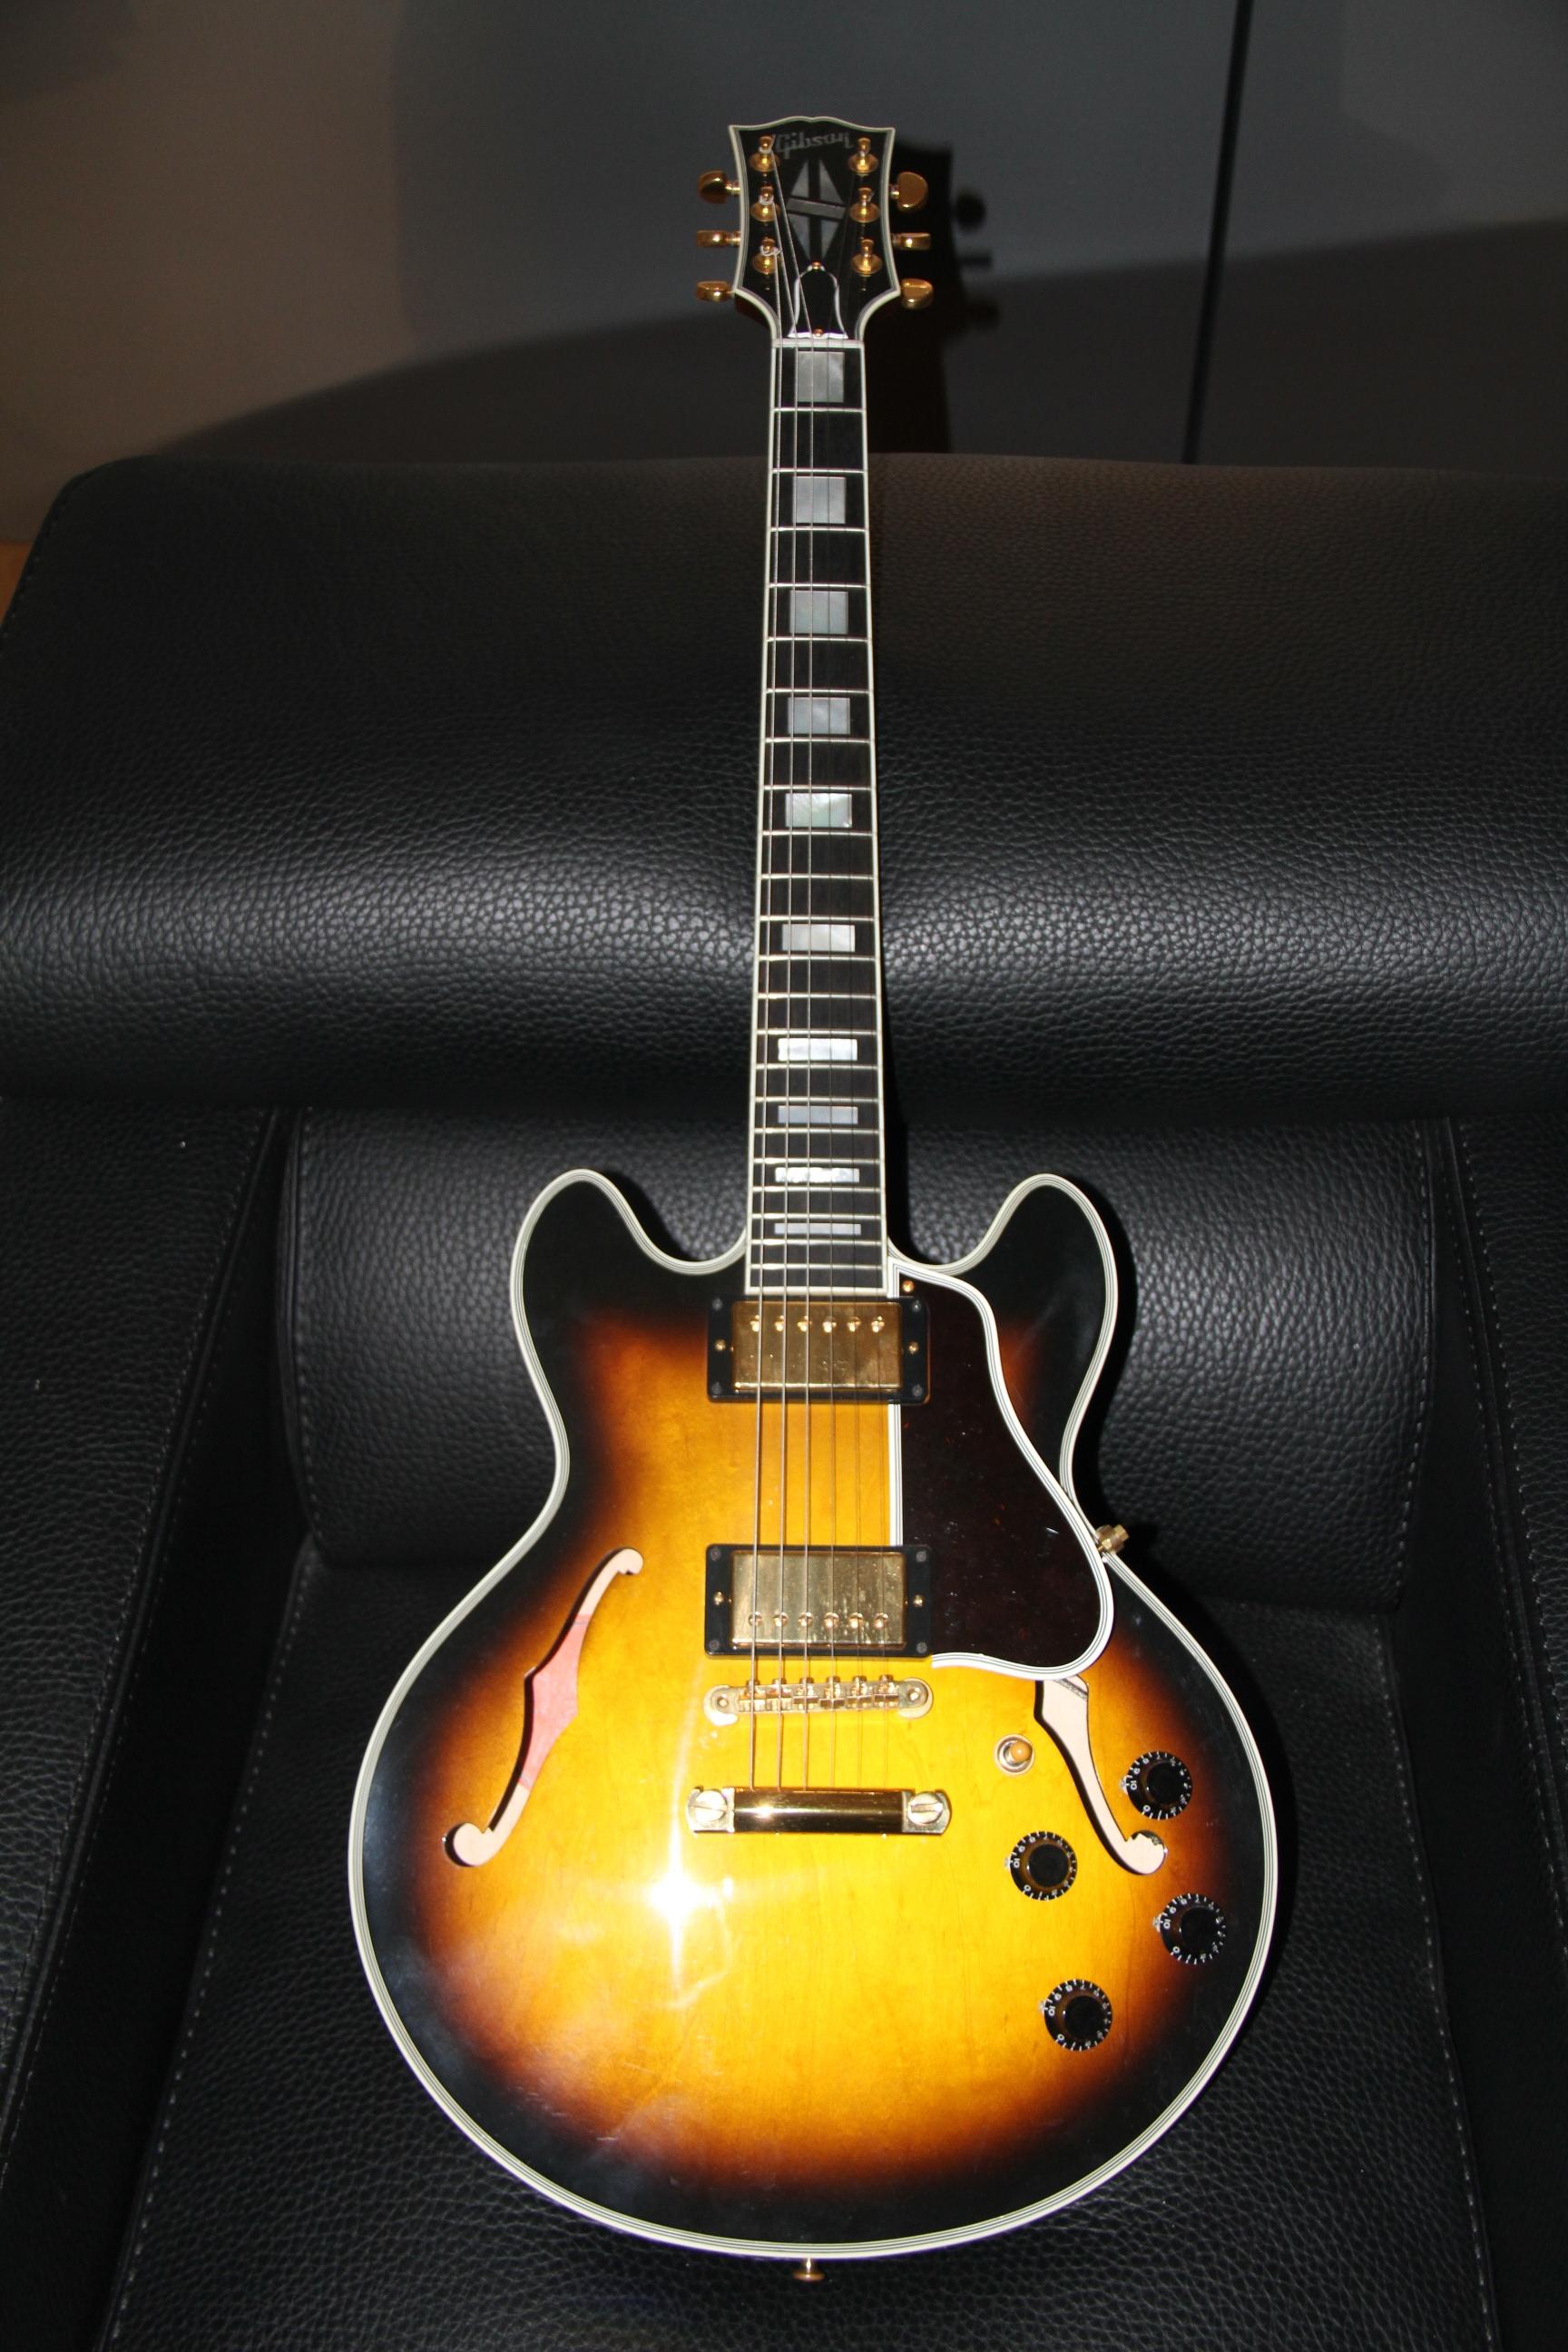 Westerngitarre Gibson J-45 Vintage Akustik Gitarre